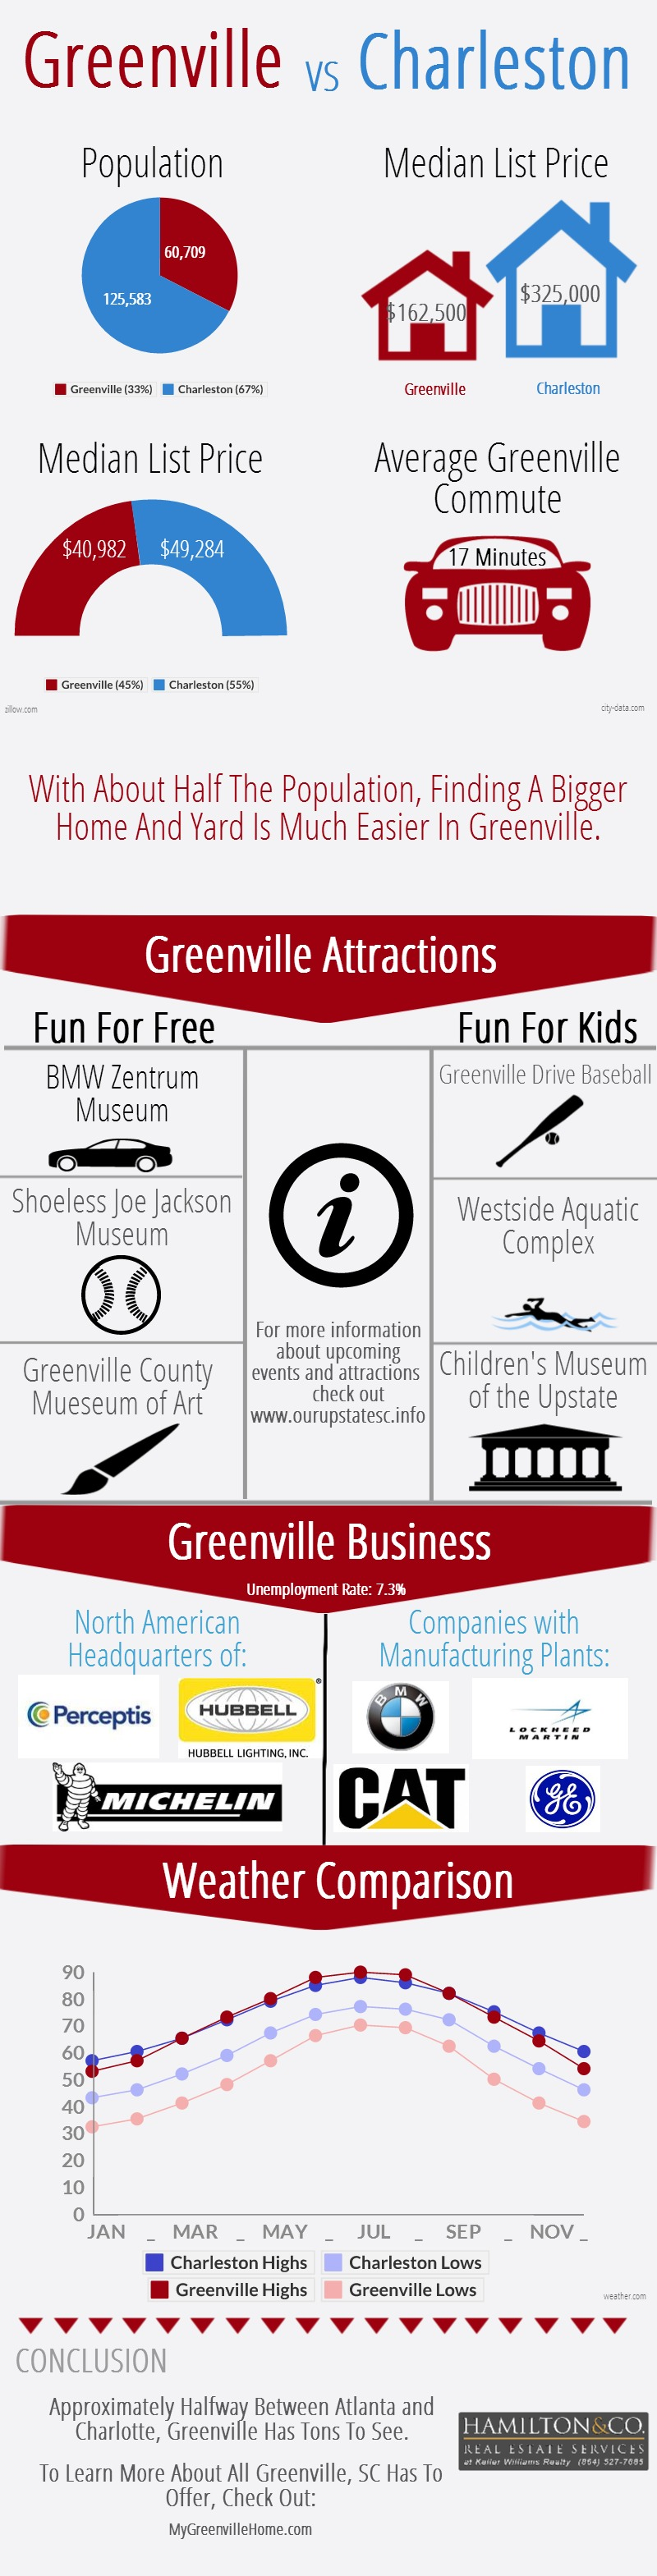 Greenville vs. Charleston